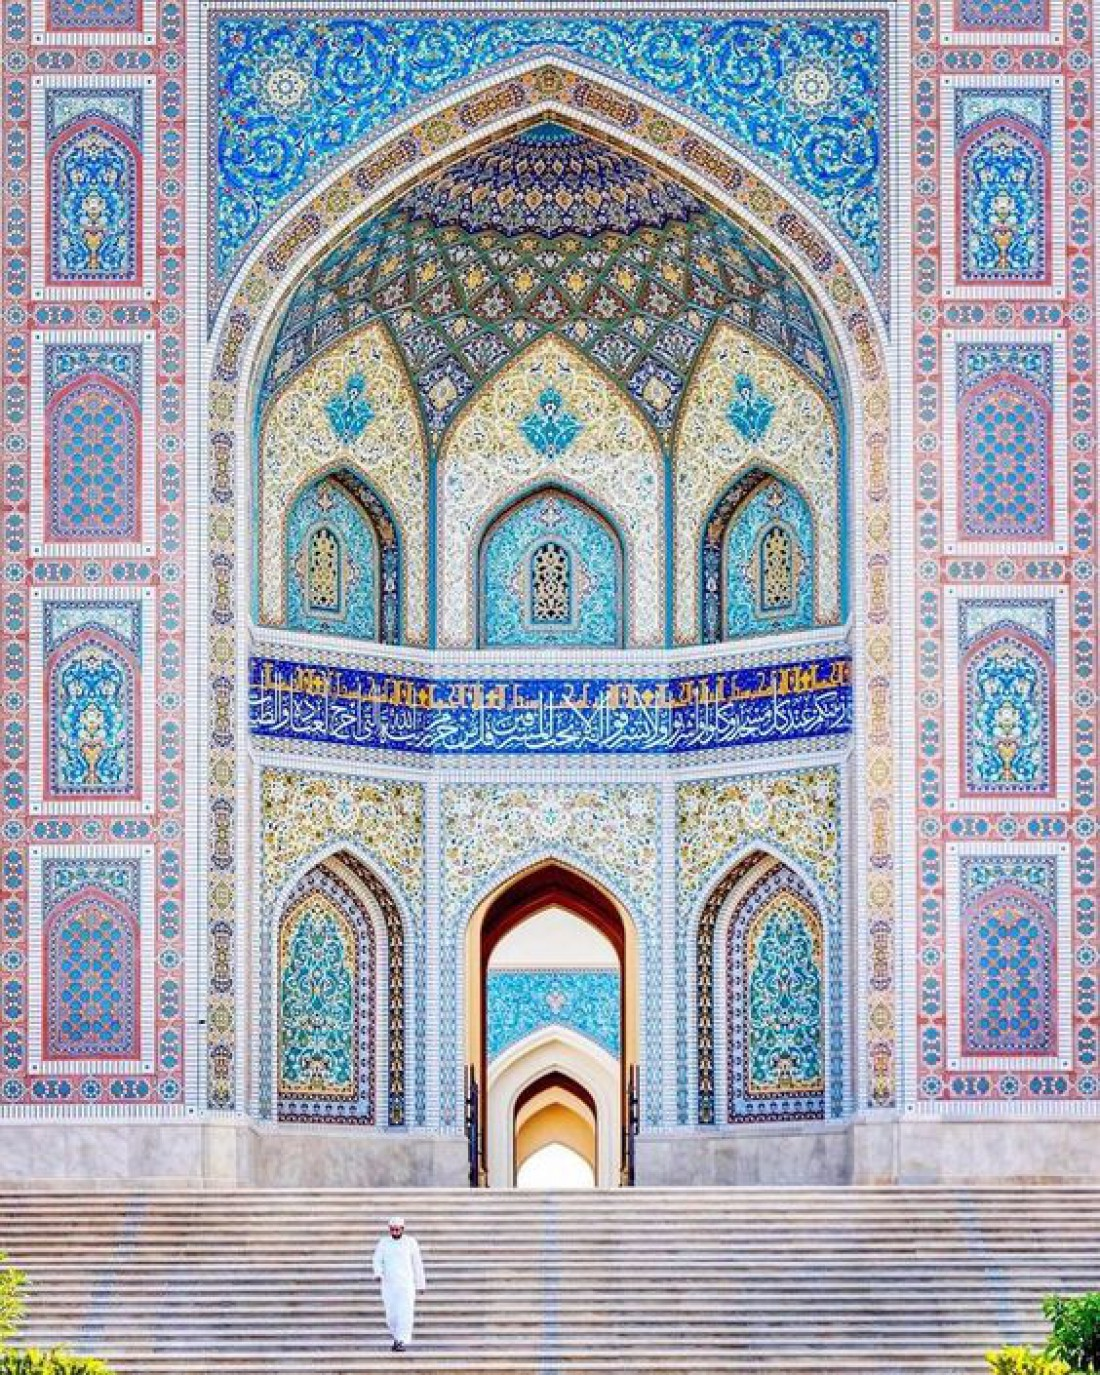 По следам Лоуренса Аравийского: Красивейшие места Омана